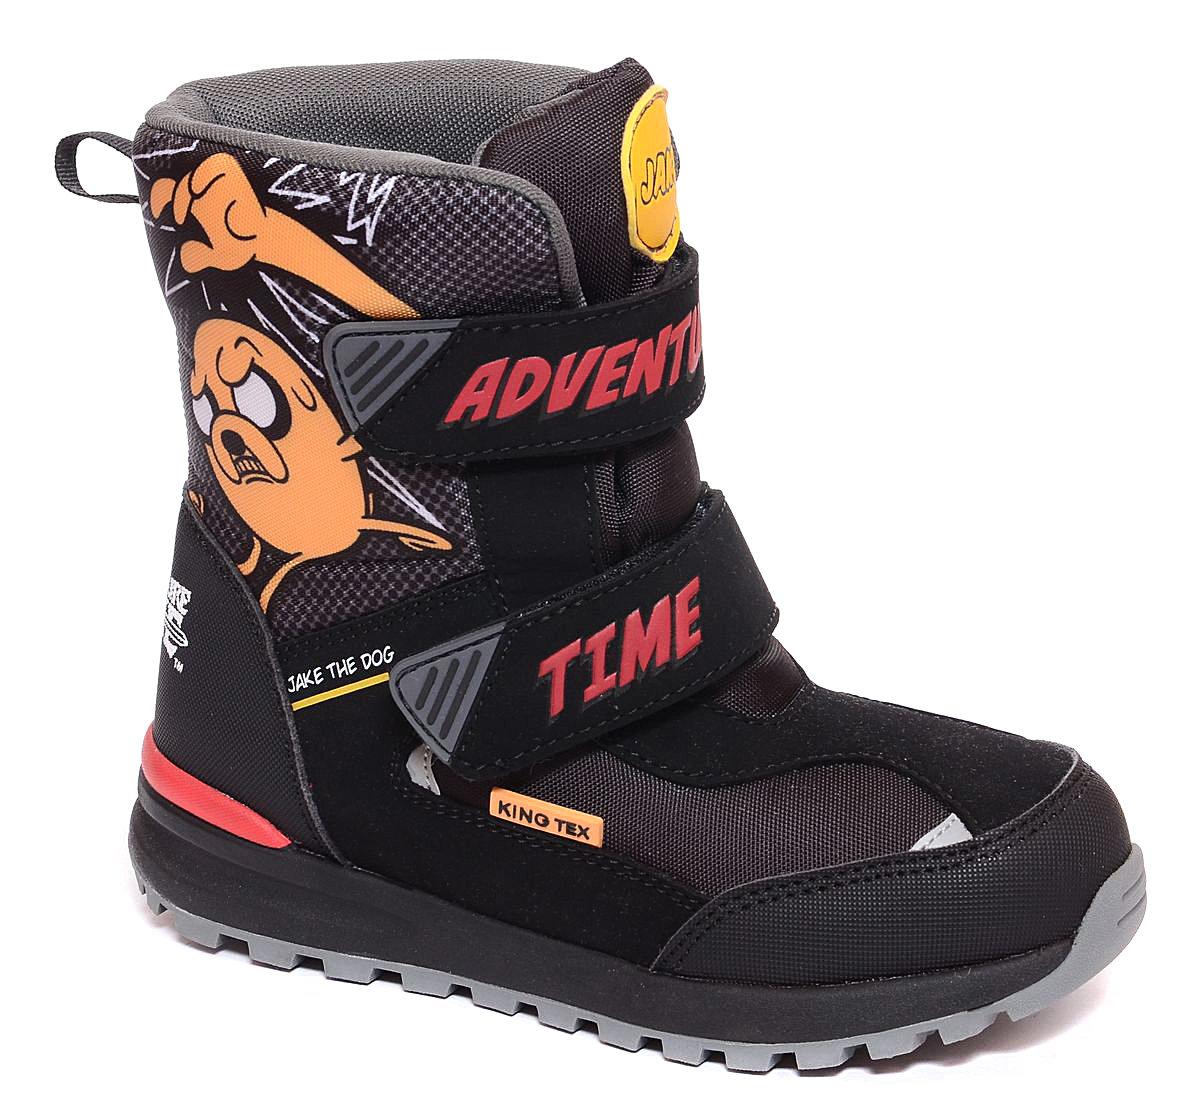 6512A_32-37_TE_WP  Adventure Time Мембрана оптом, размеры 32-37 6512A_32-37_TE_WP